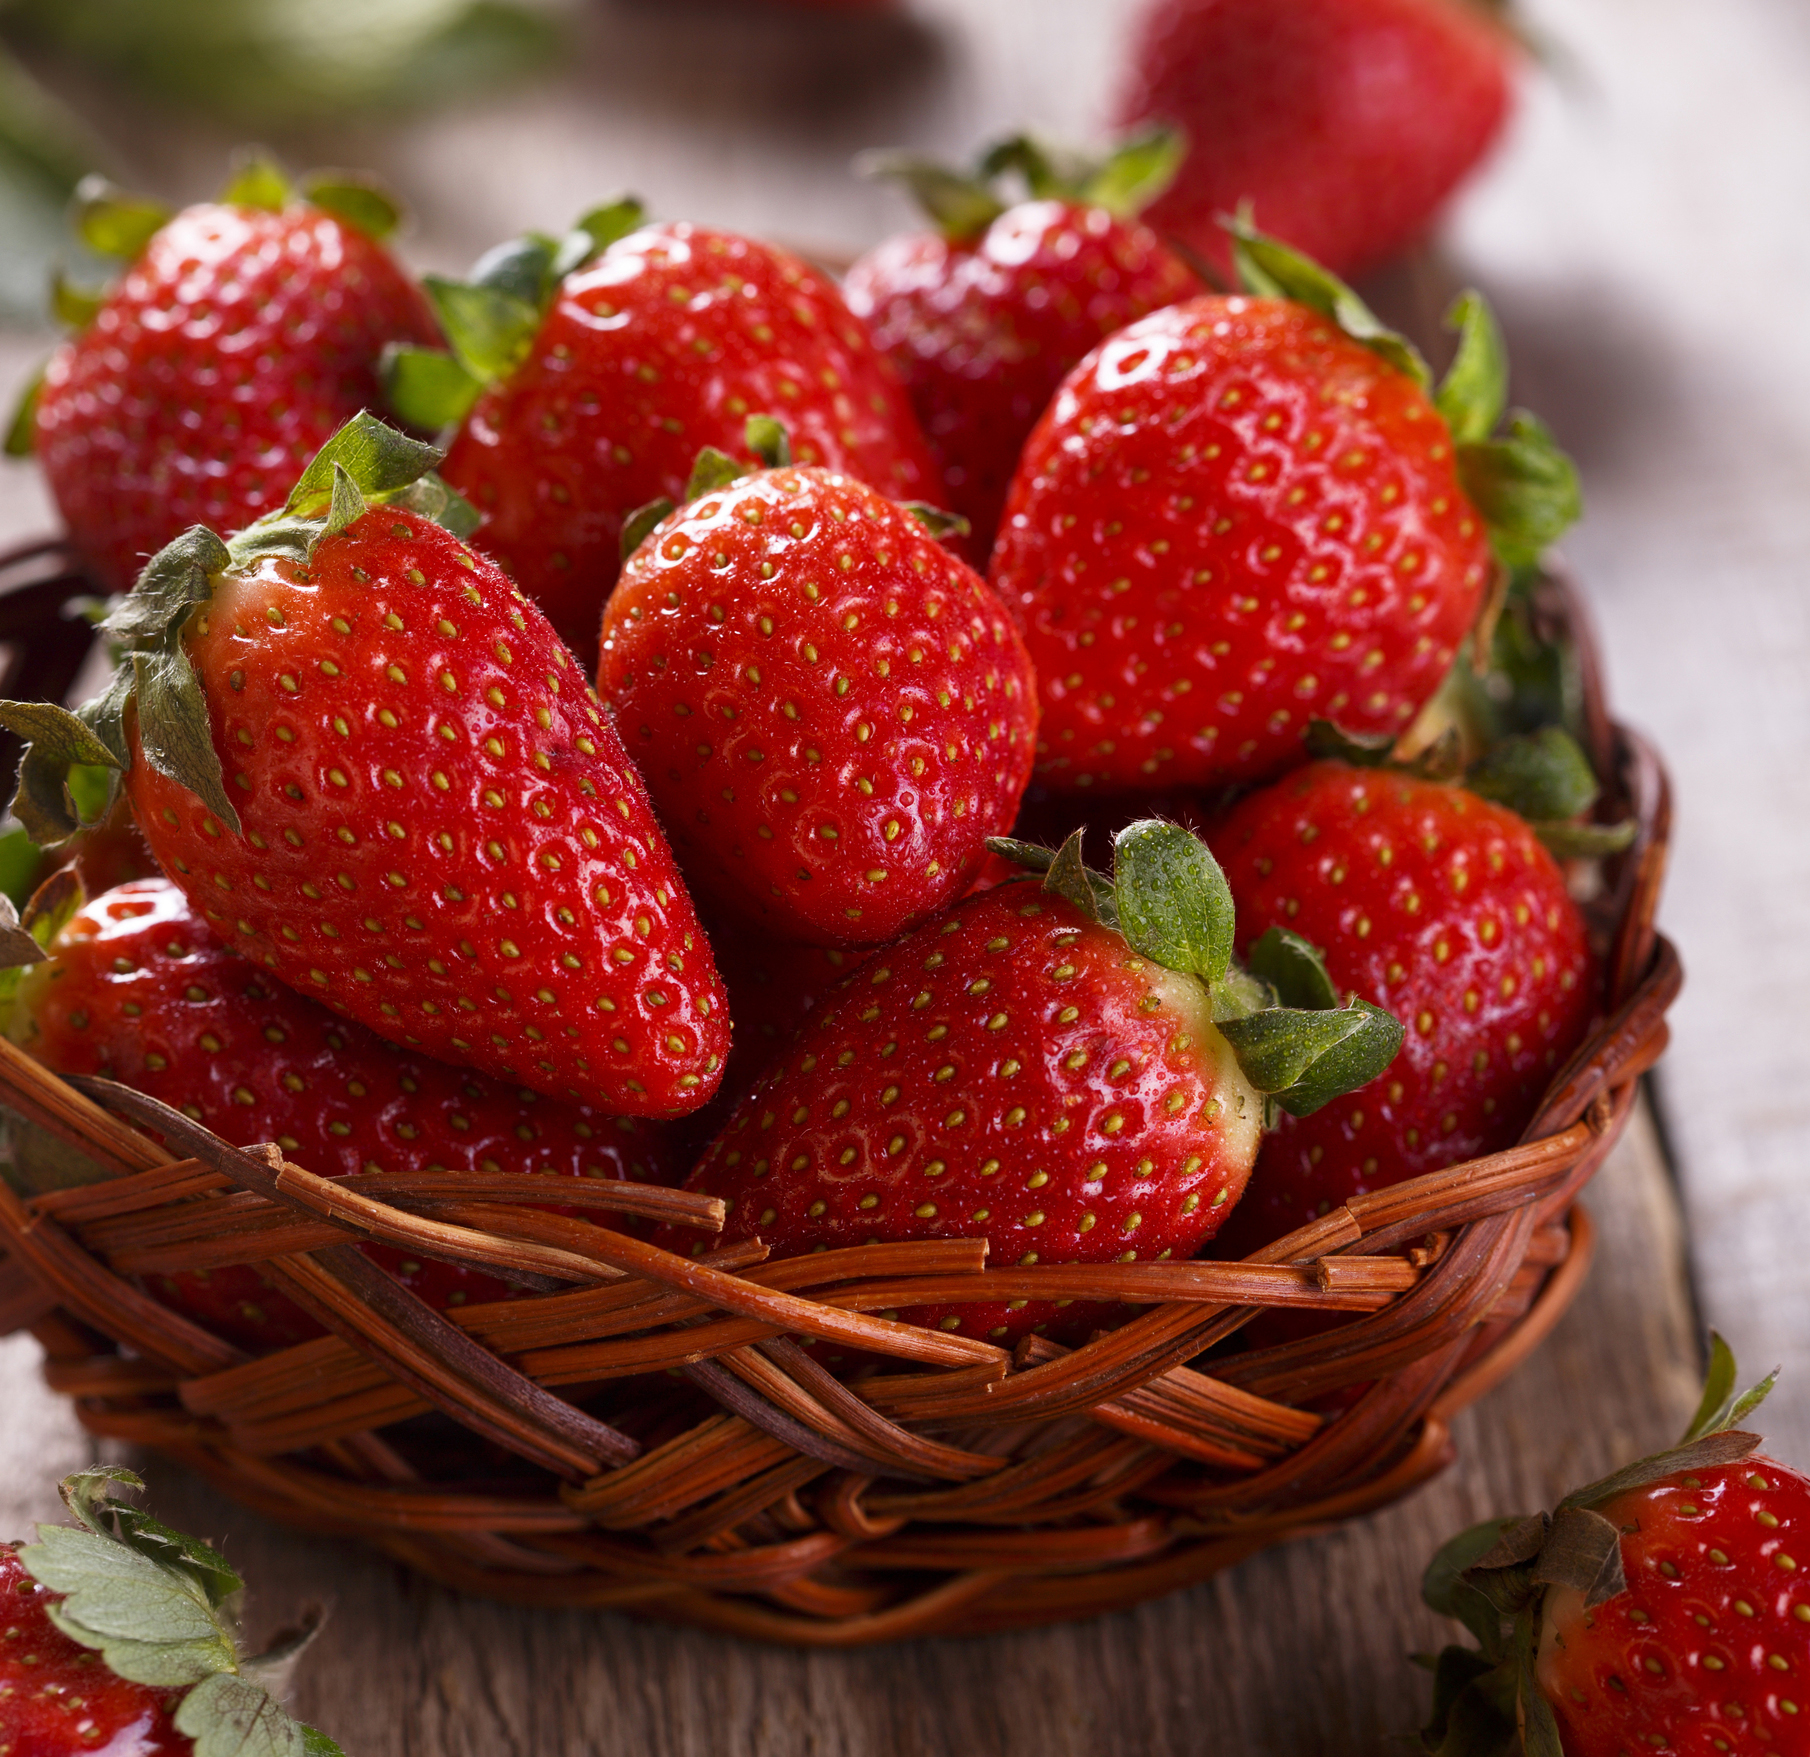 636734662055769503strawberry.jpg